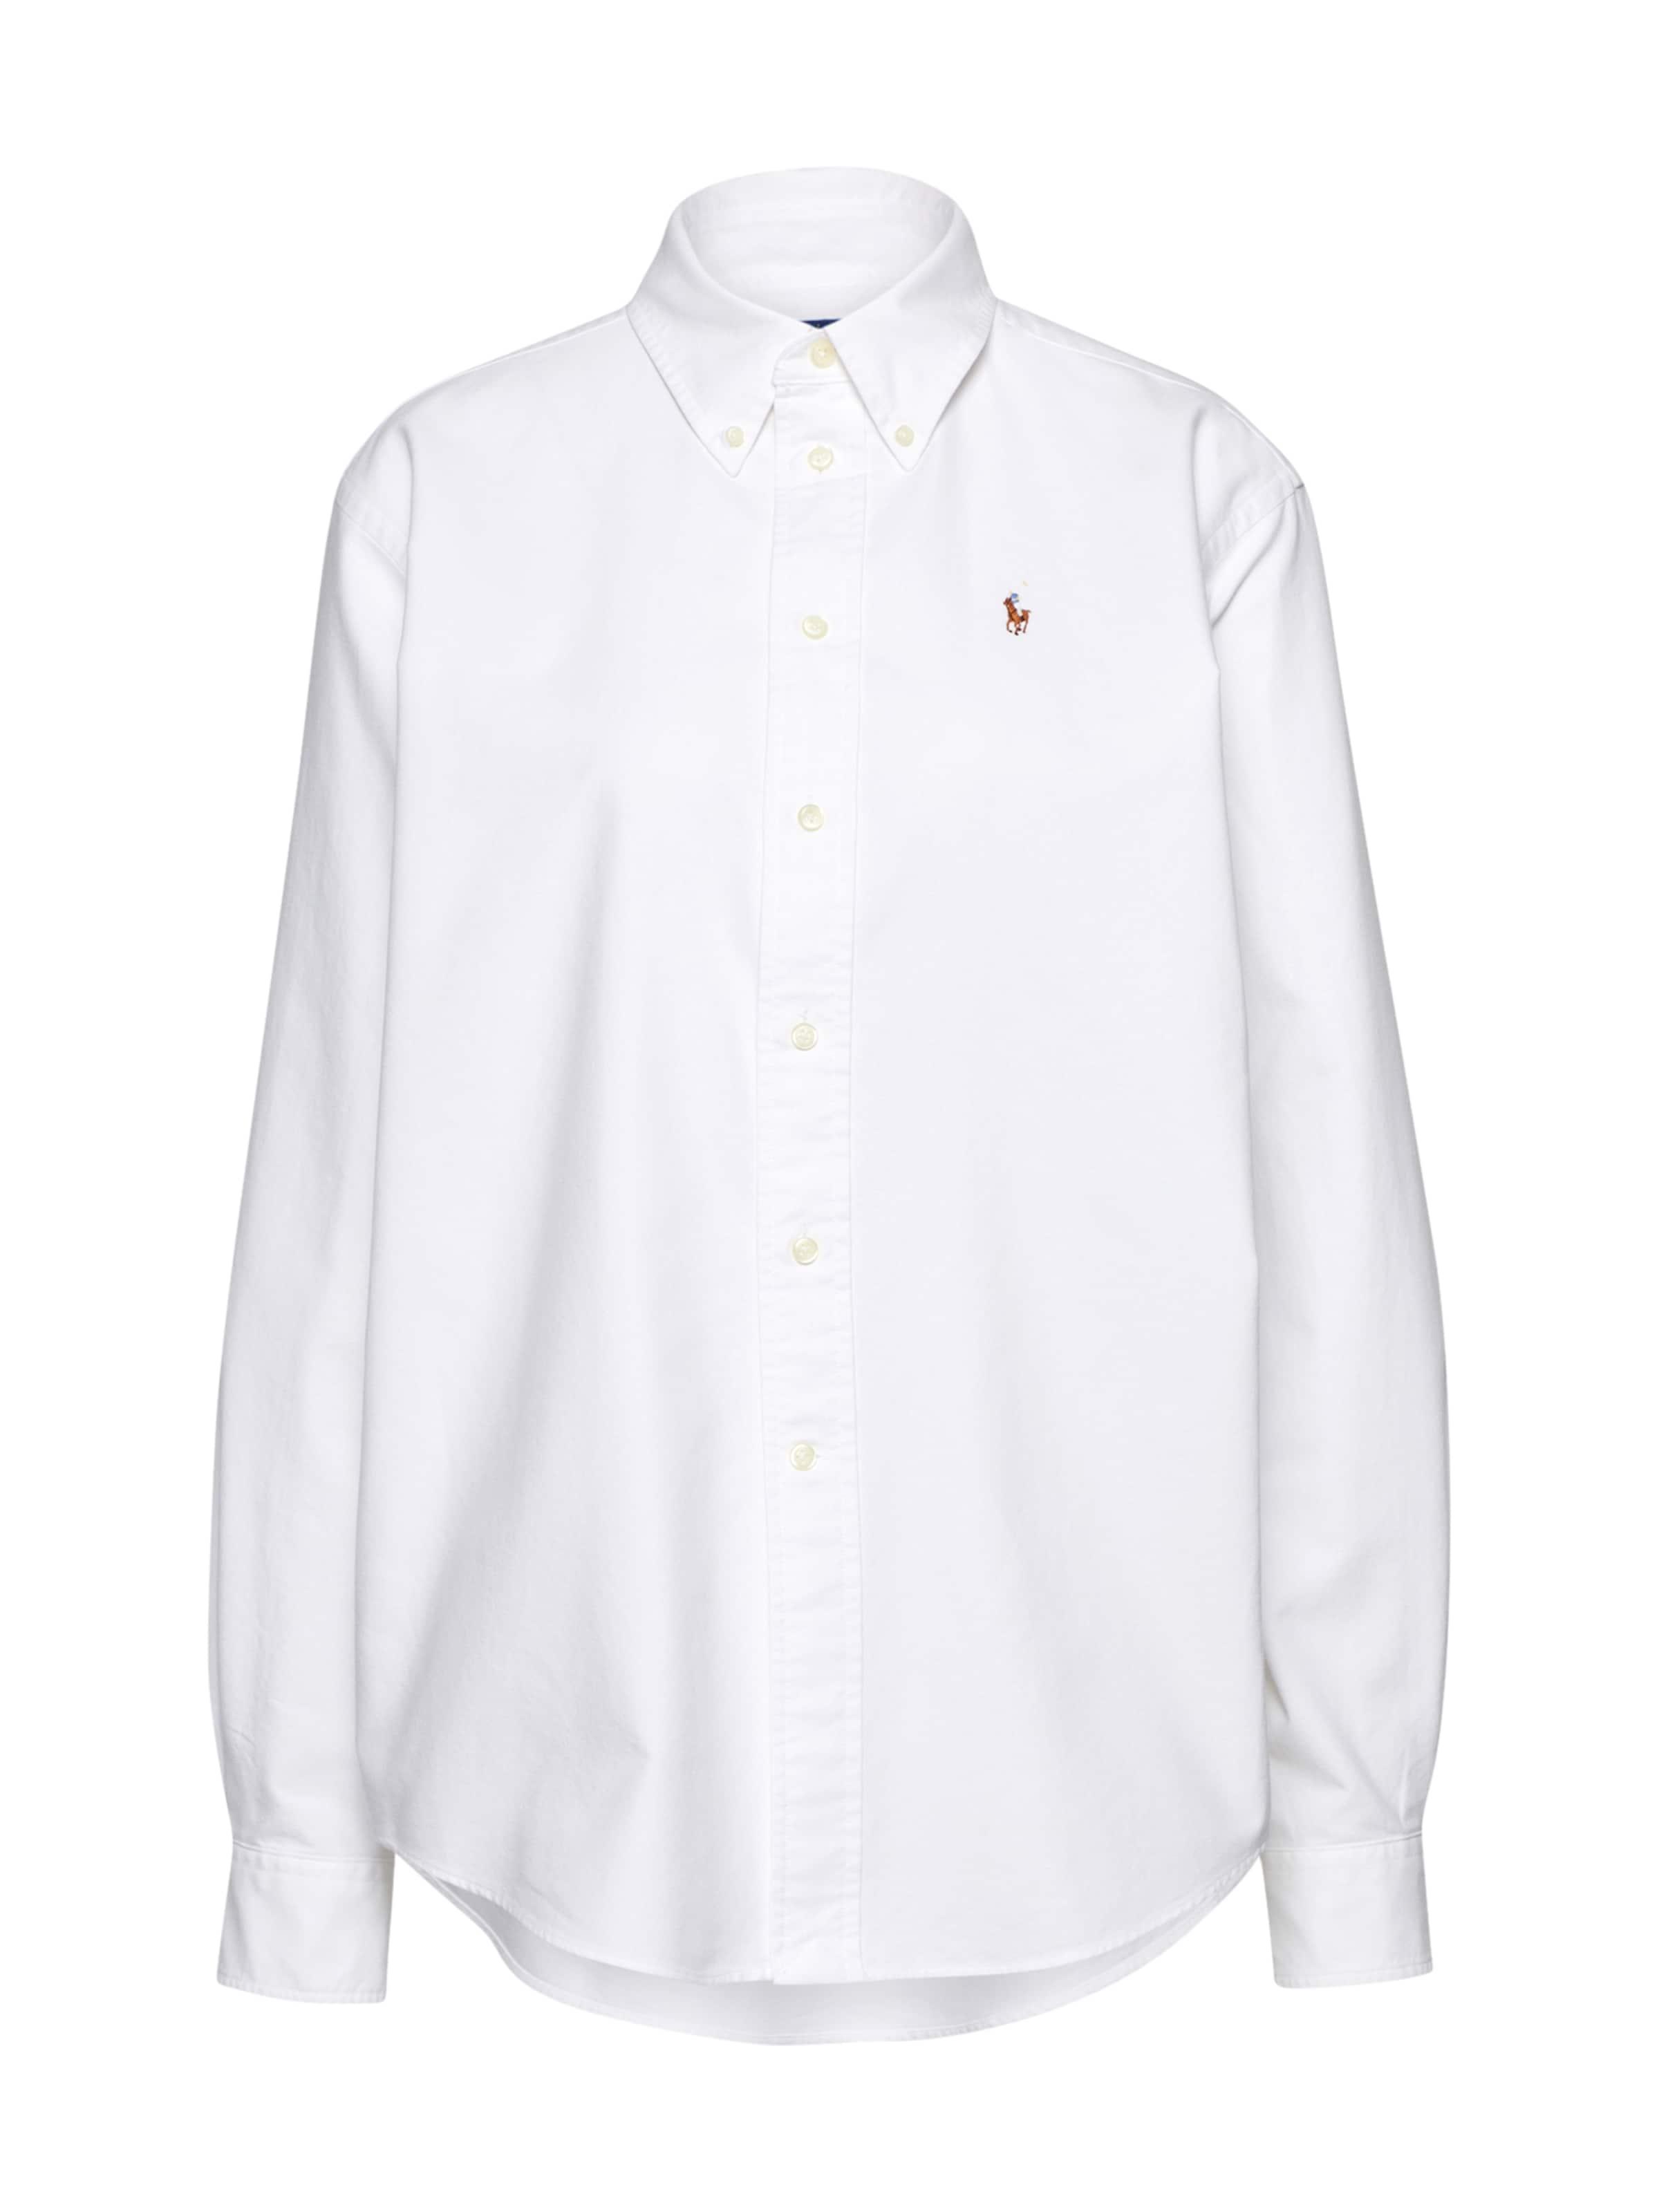 Polo Ralph Lauren Chemisier En Blanc OPXN8wnk0Z